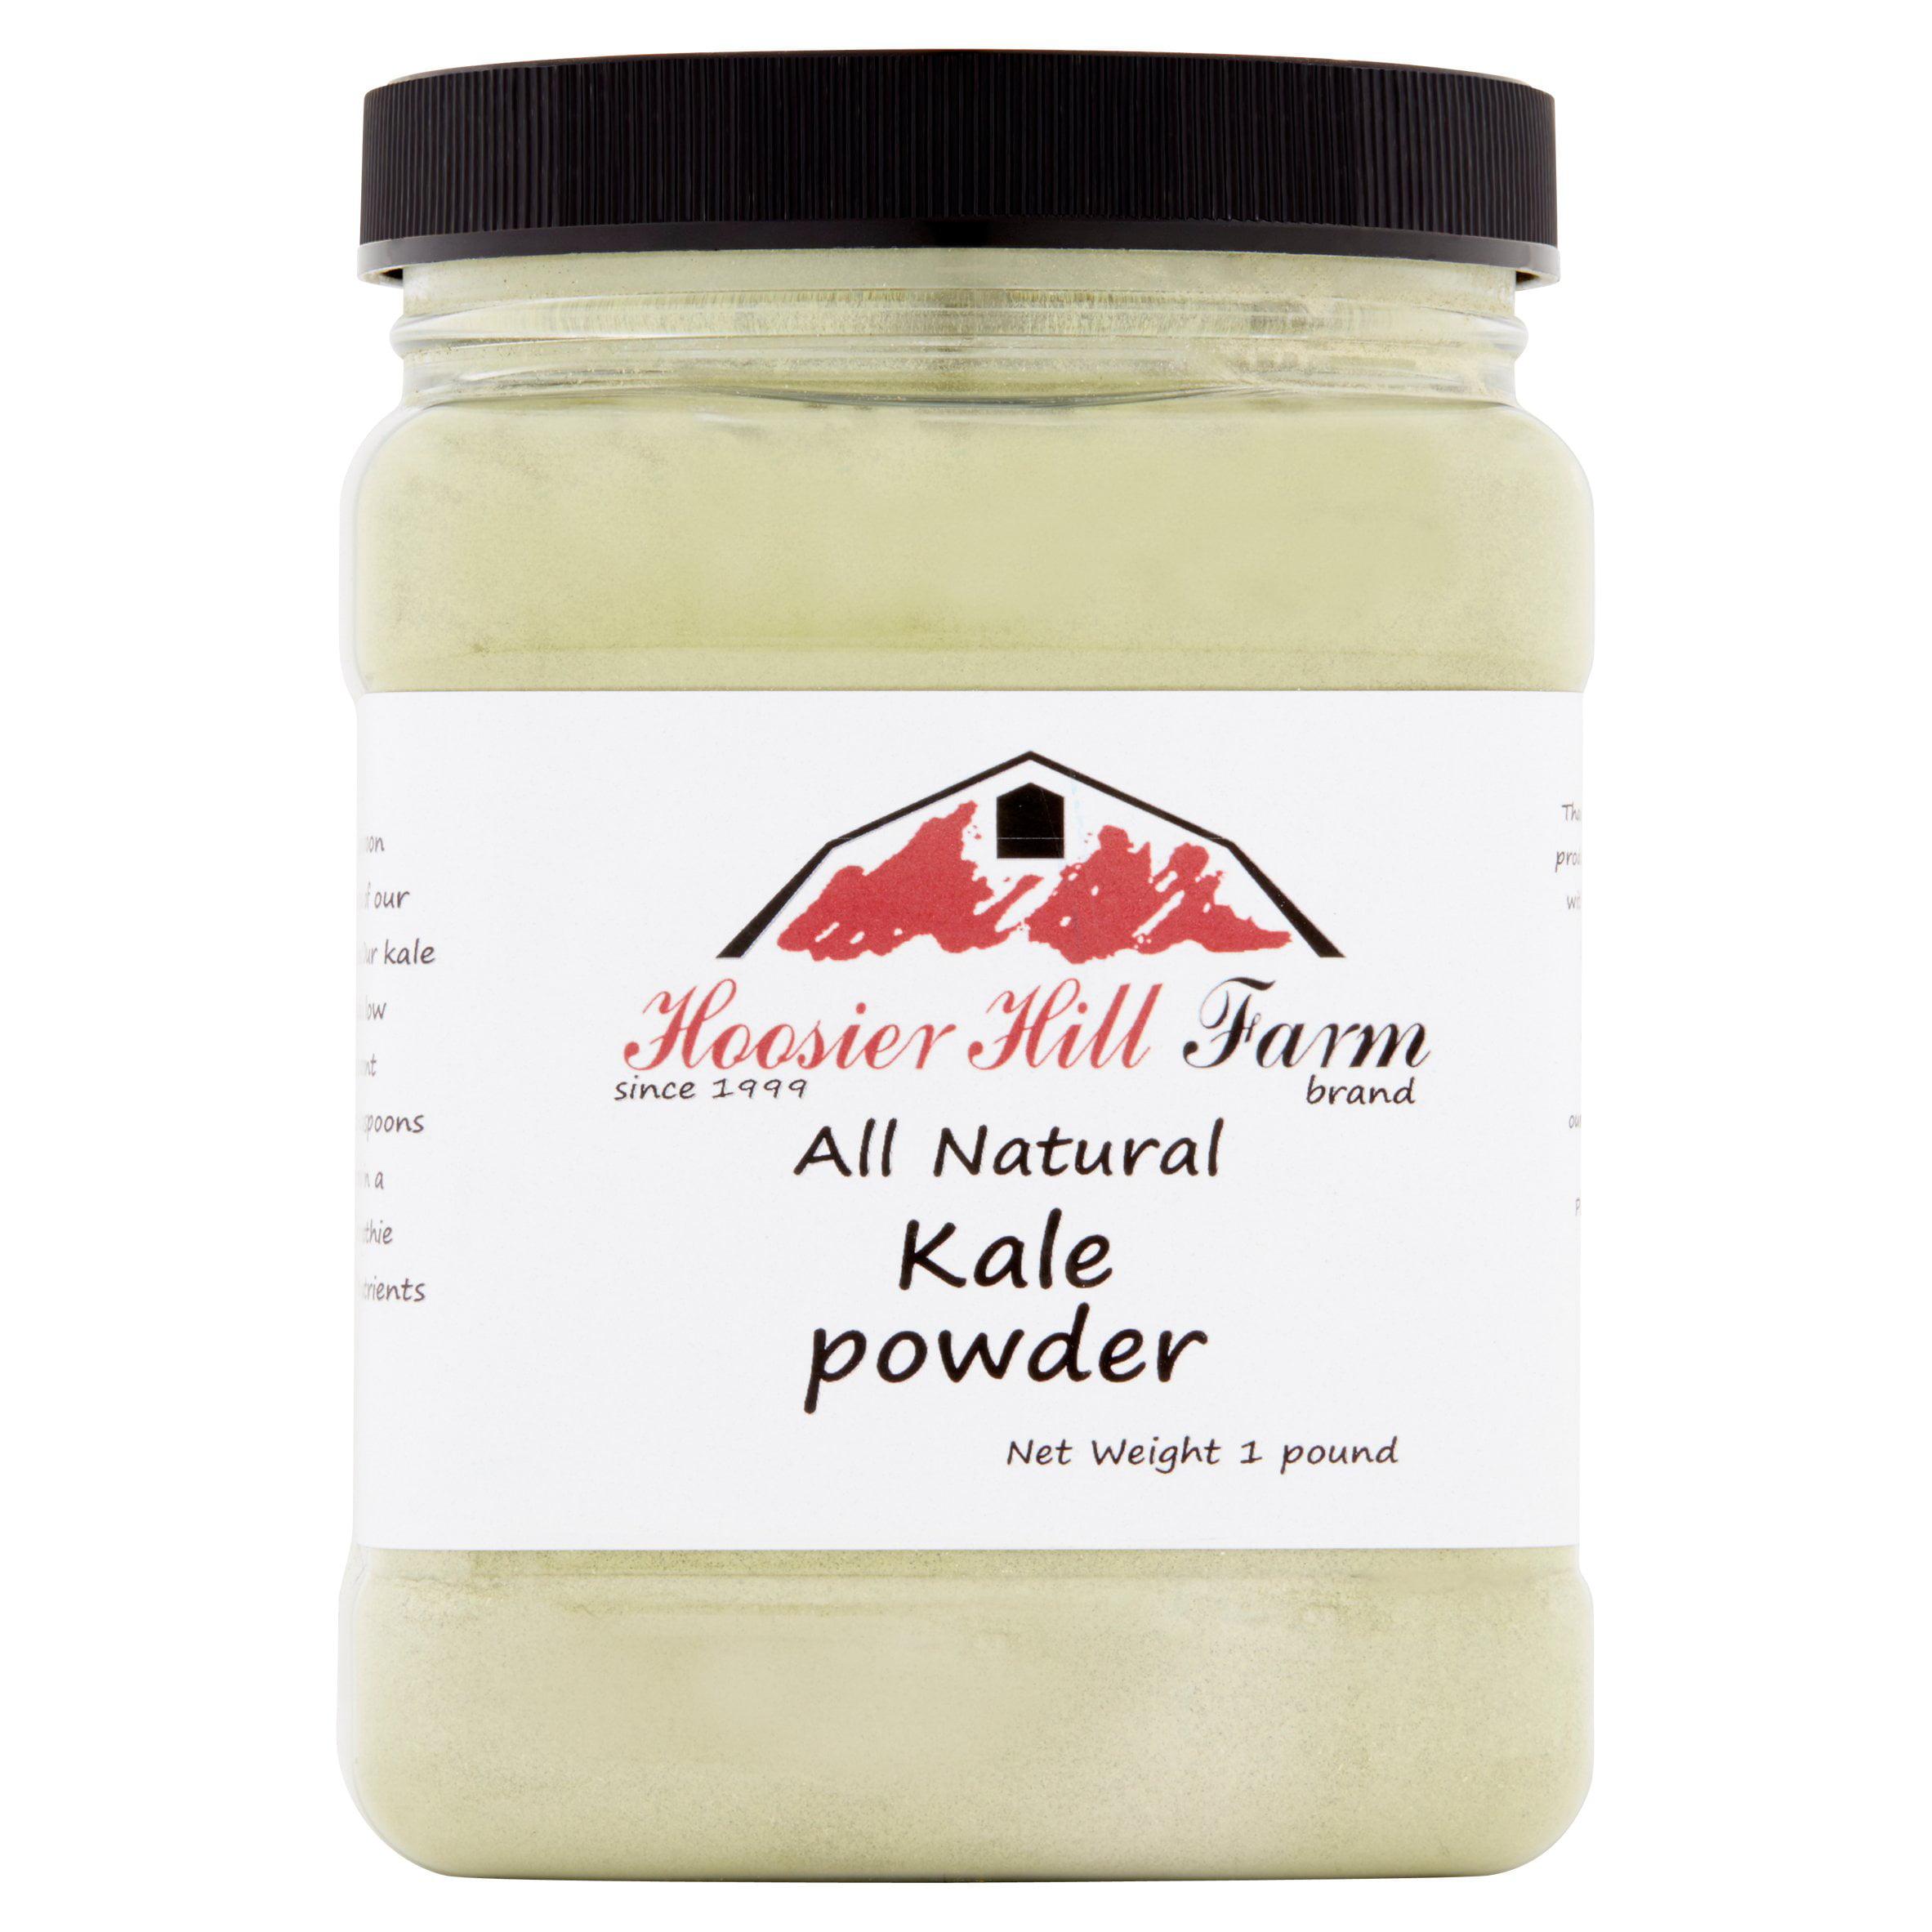 Hoosier Hill Farm Natural Kale Powder, Grown in the USA, 1 lb plastic jar